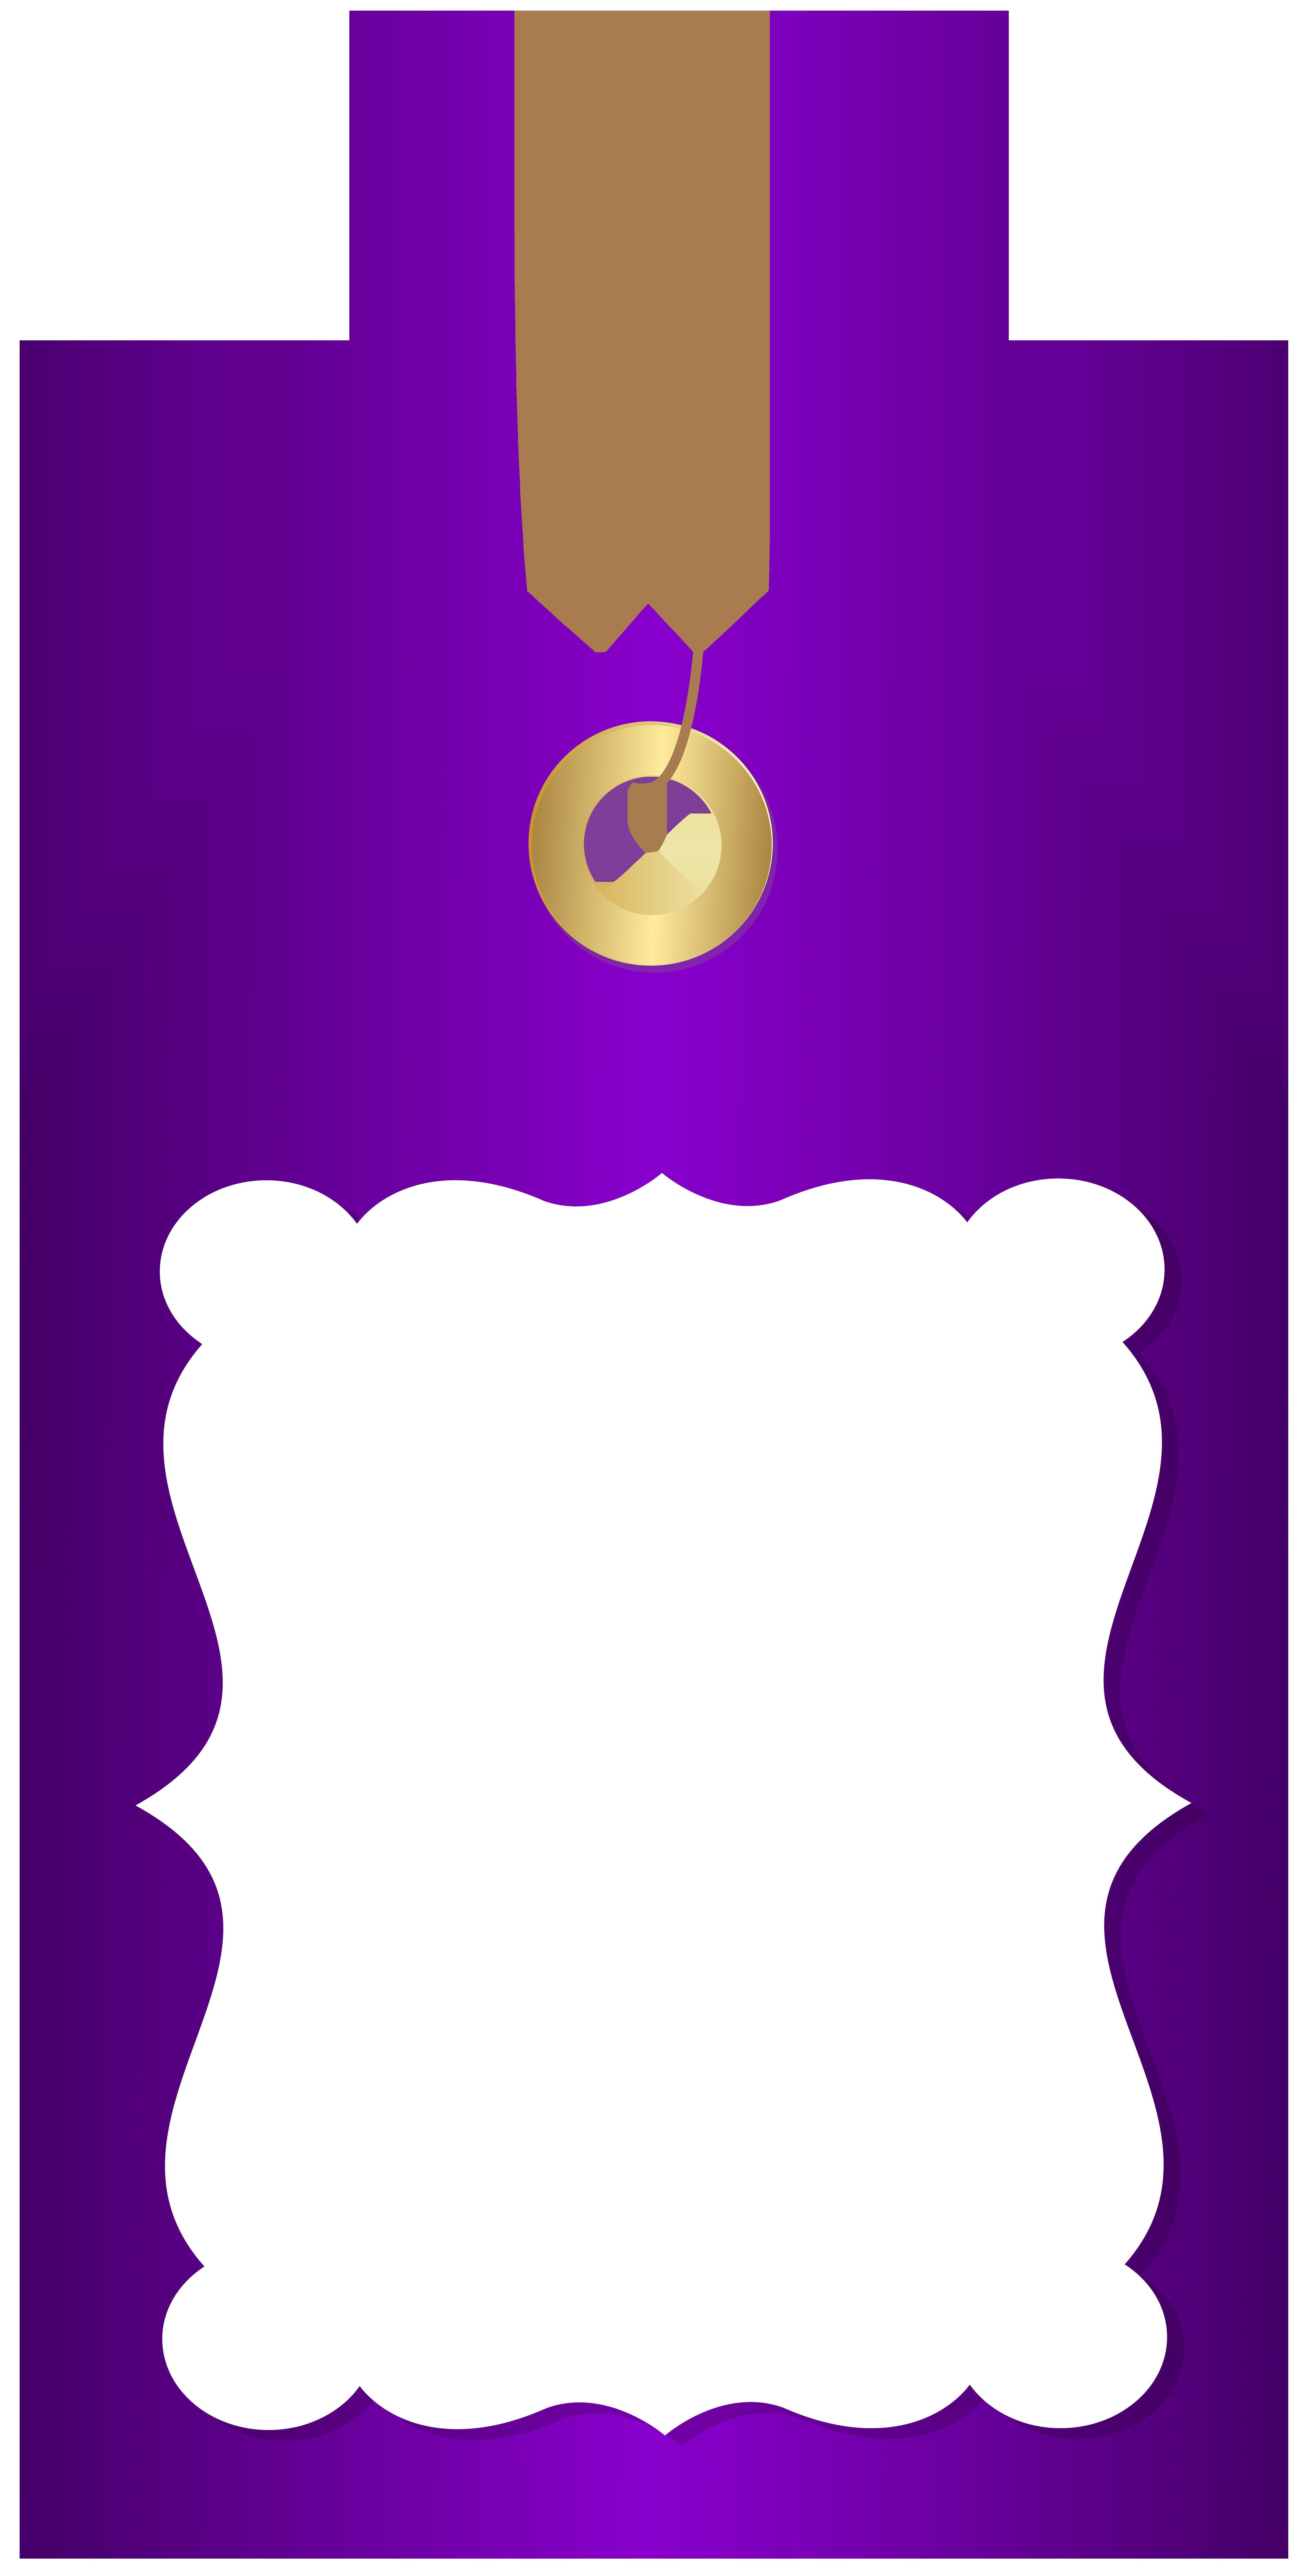 Purple Deco Price Tag PNG Clip Art Image.